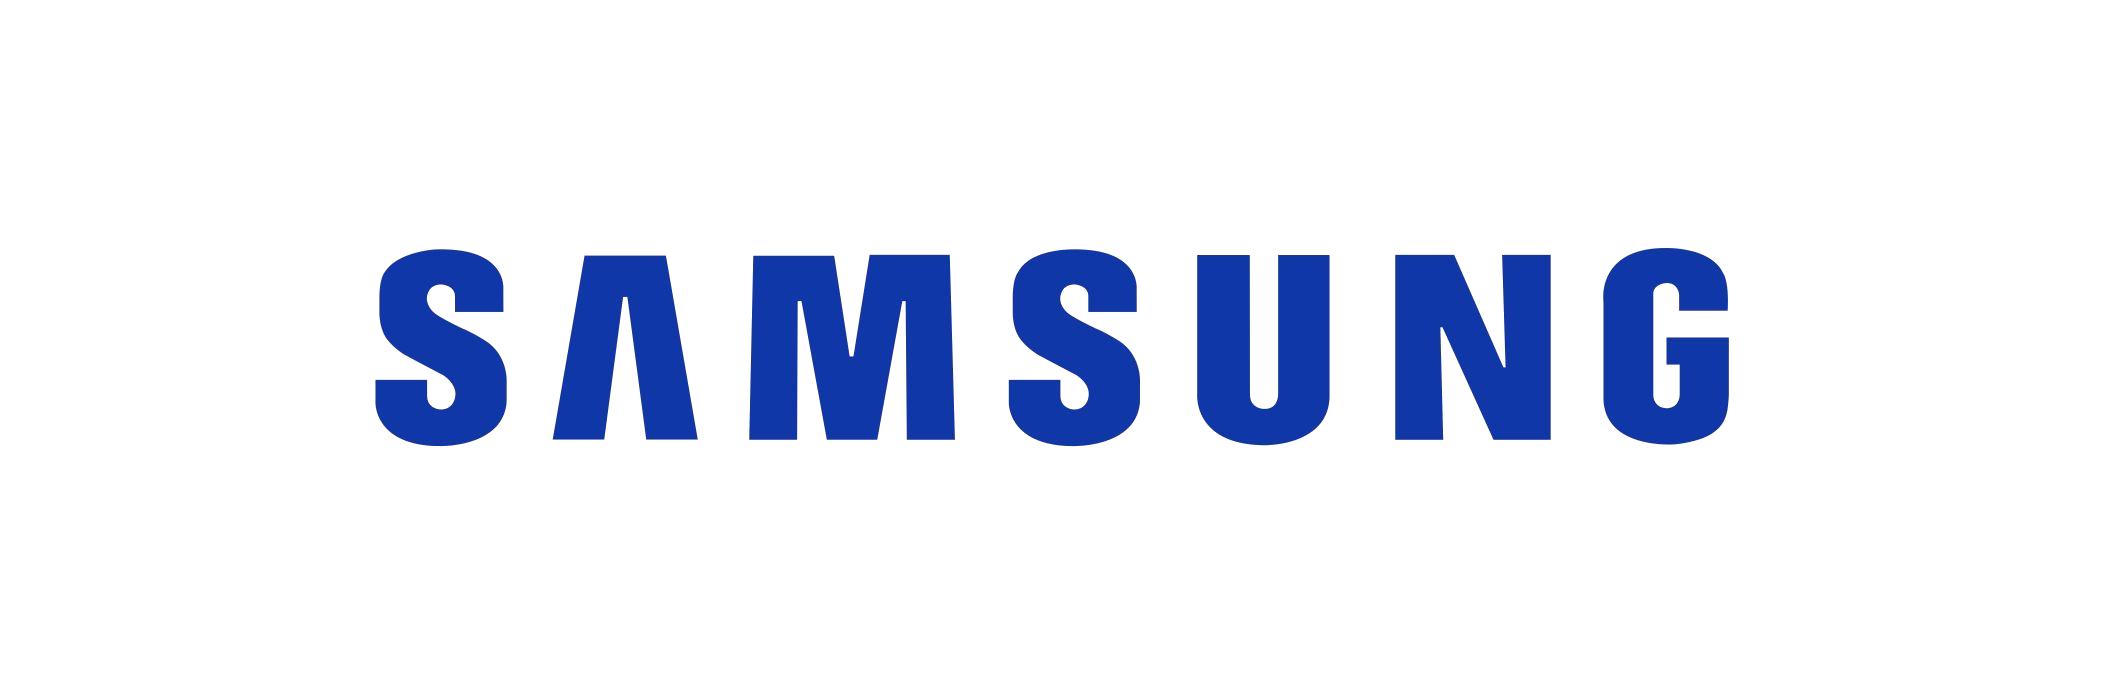 samsung-logo-png-samsung-logo-png-2104